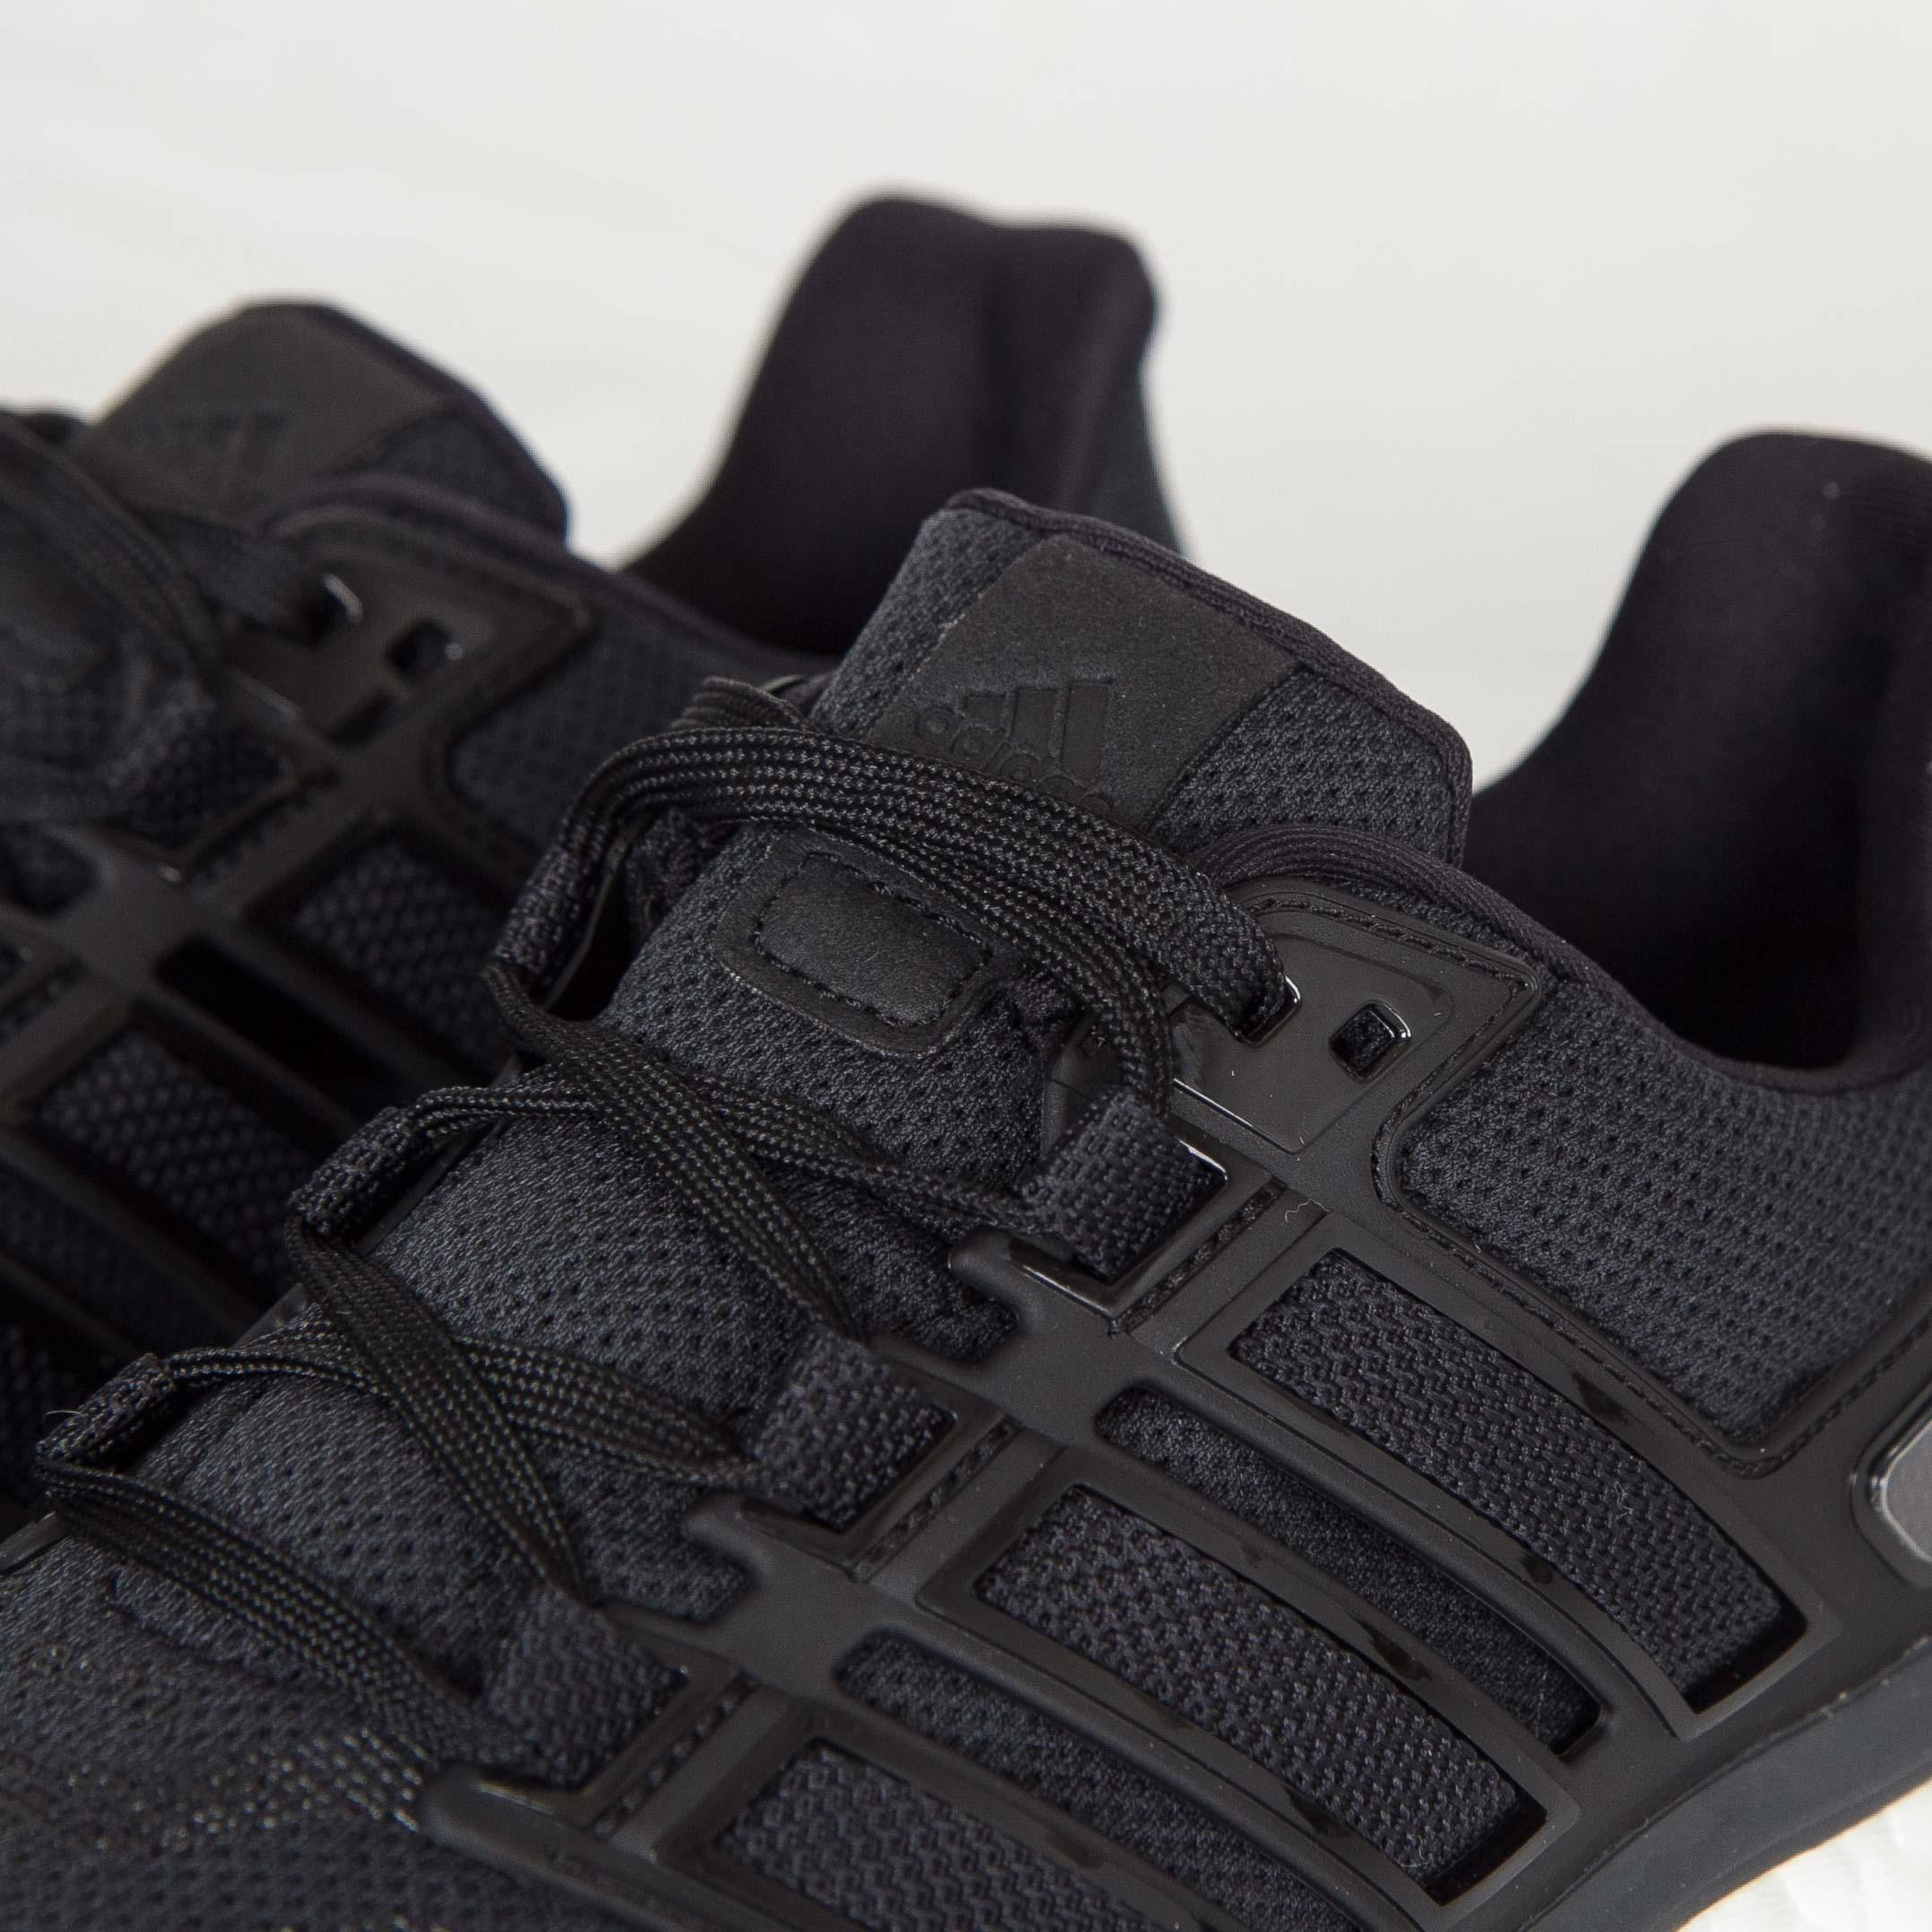 763a428430f2 adidas Energy Boost 3 - Aq1865 - Sneakersnstuff